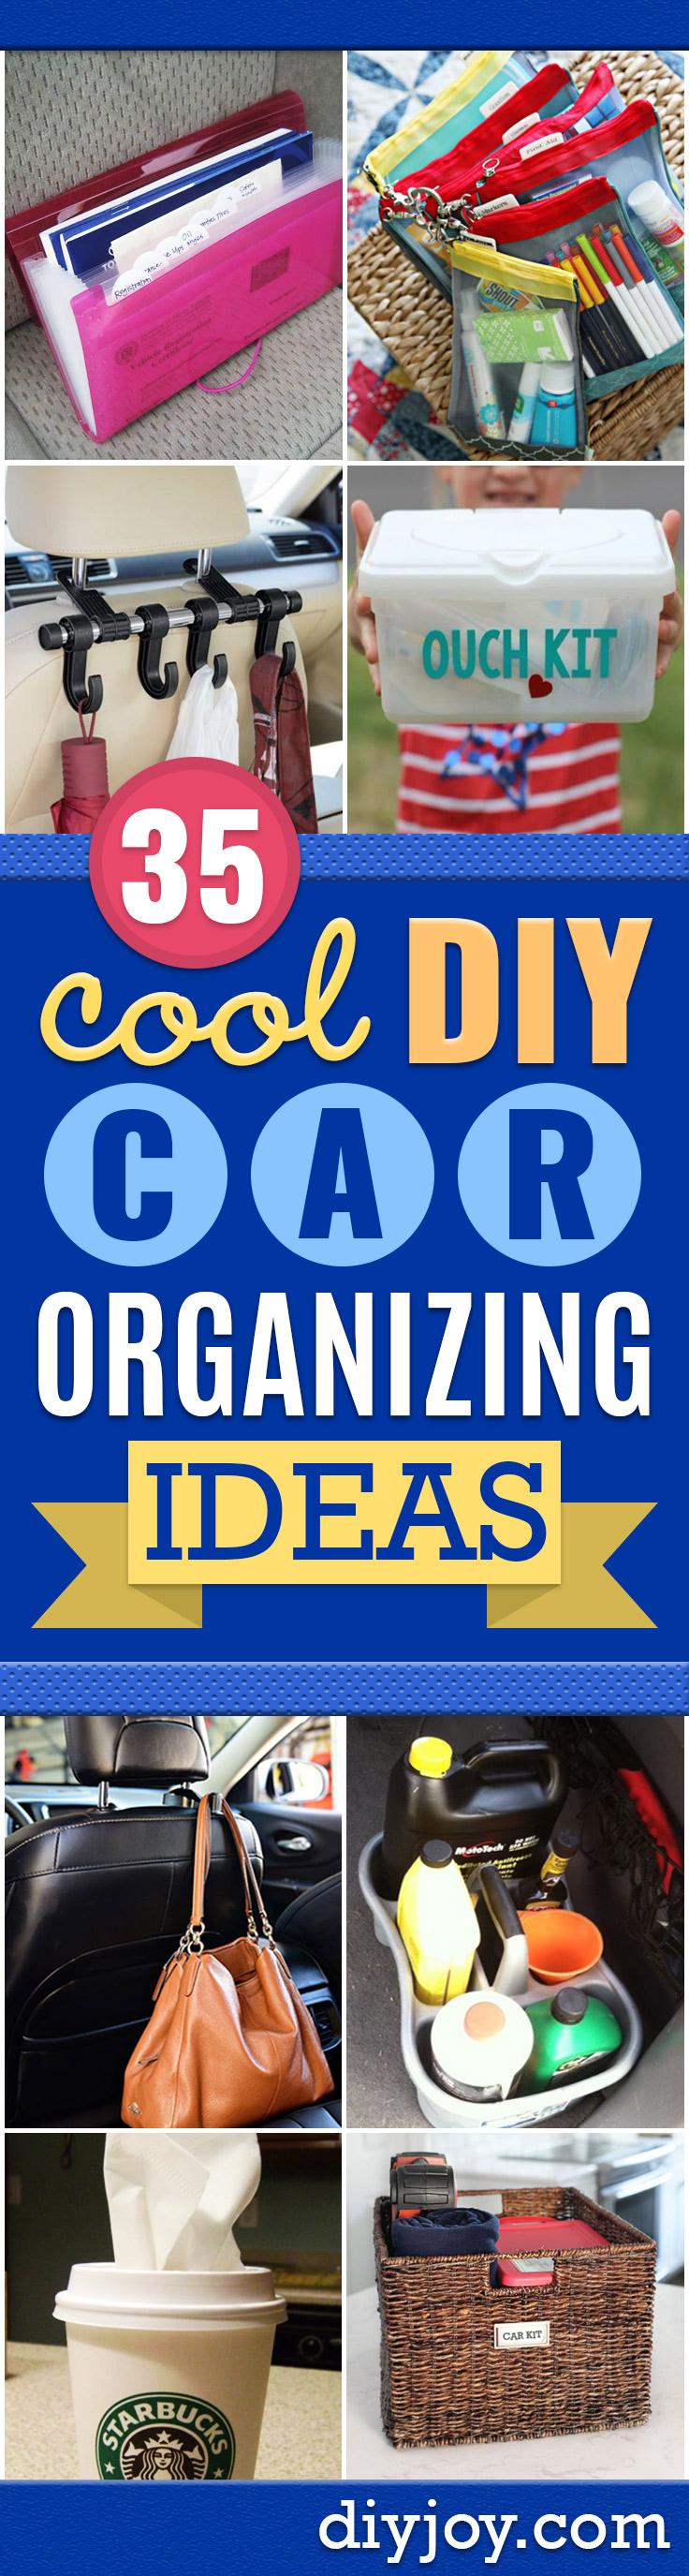 35 genius diy car organizing ideas car organization ideas diy tips and tricks for organizing cars dollar store storage projects solutioingenieria Gallery